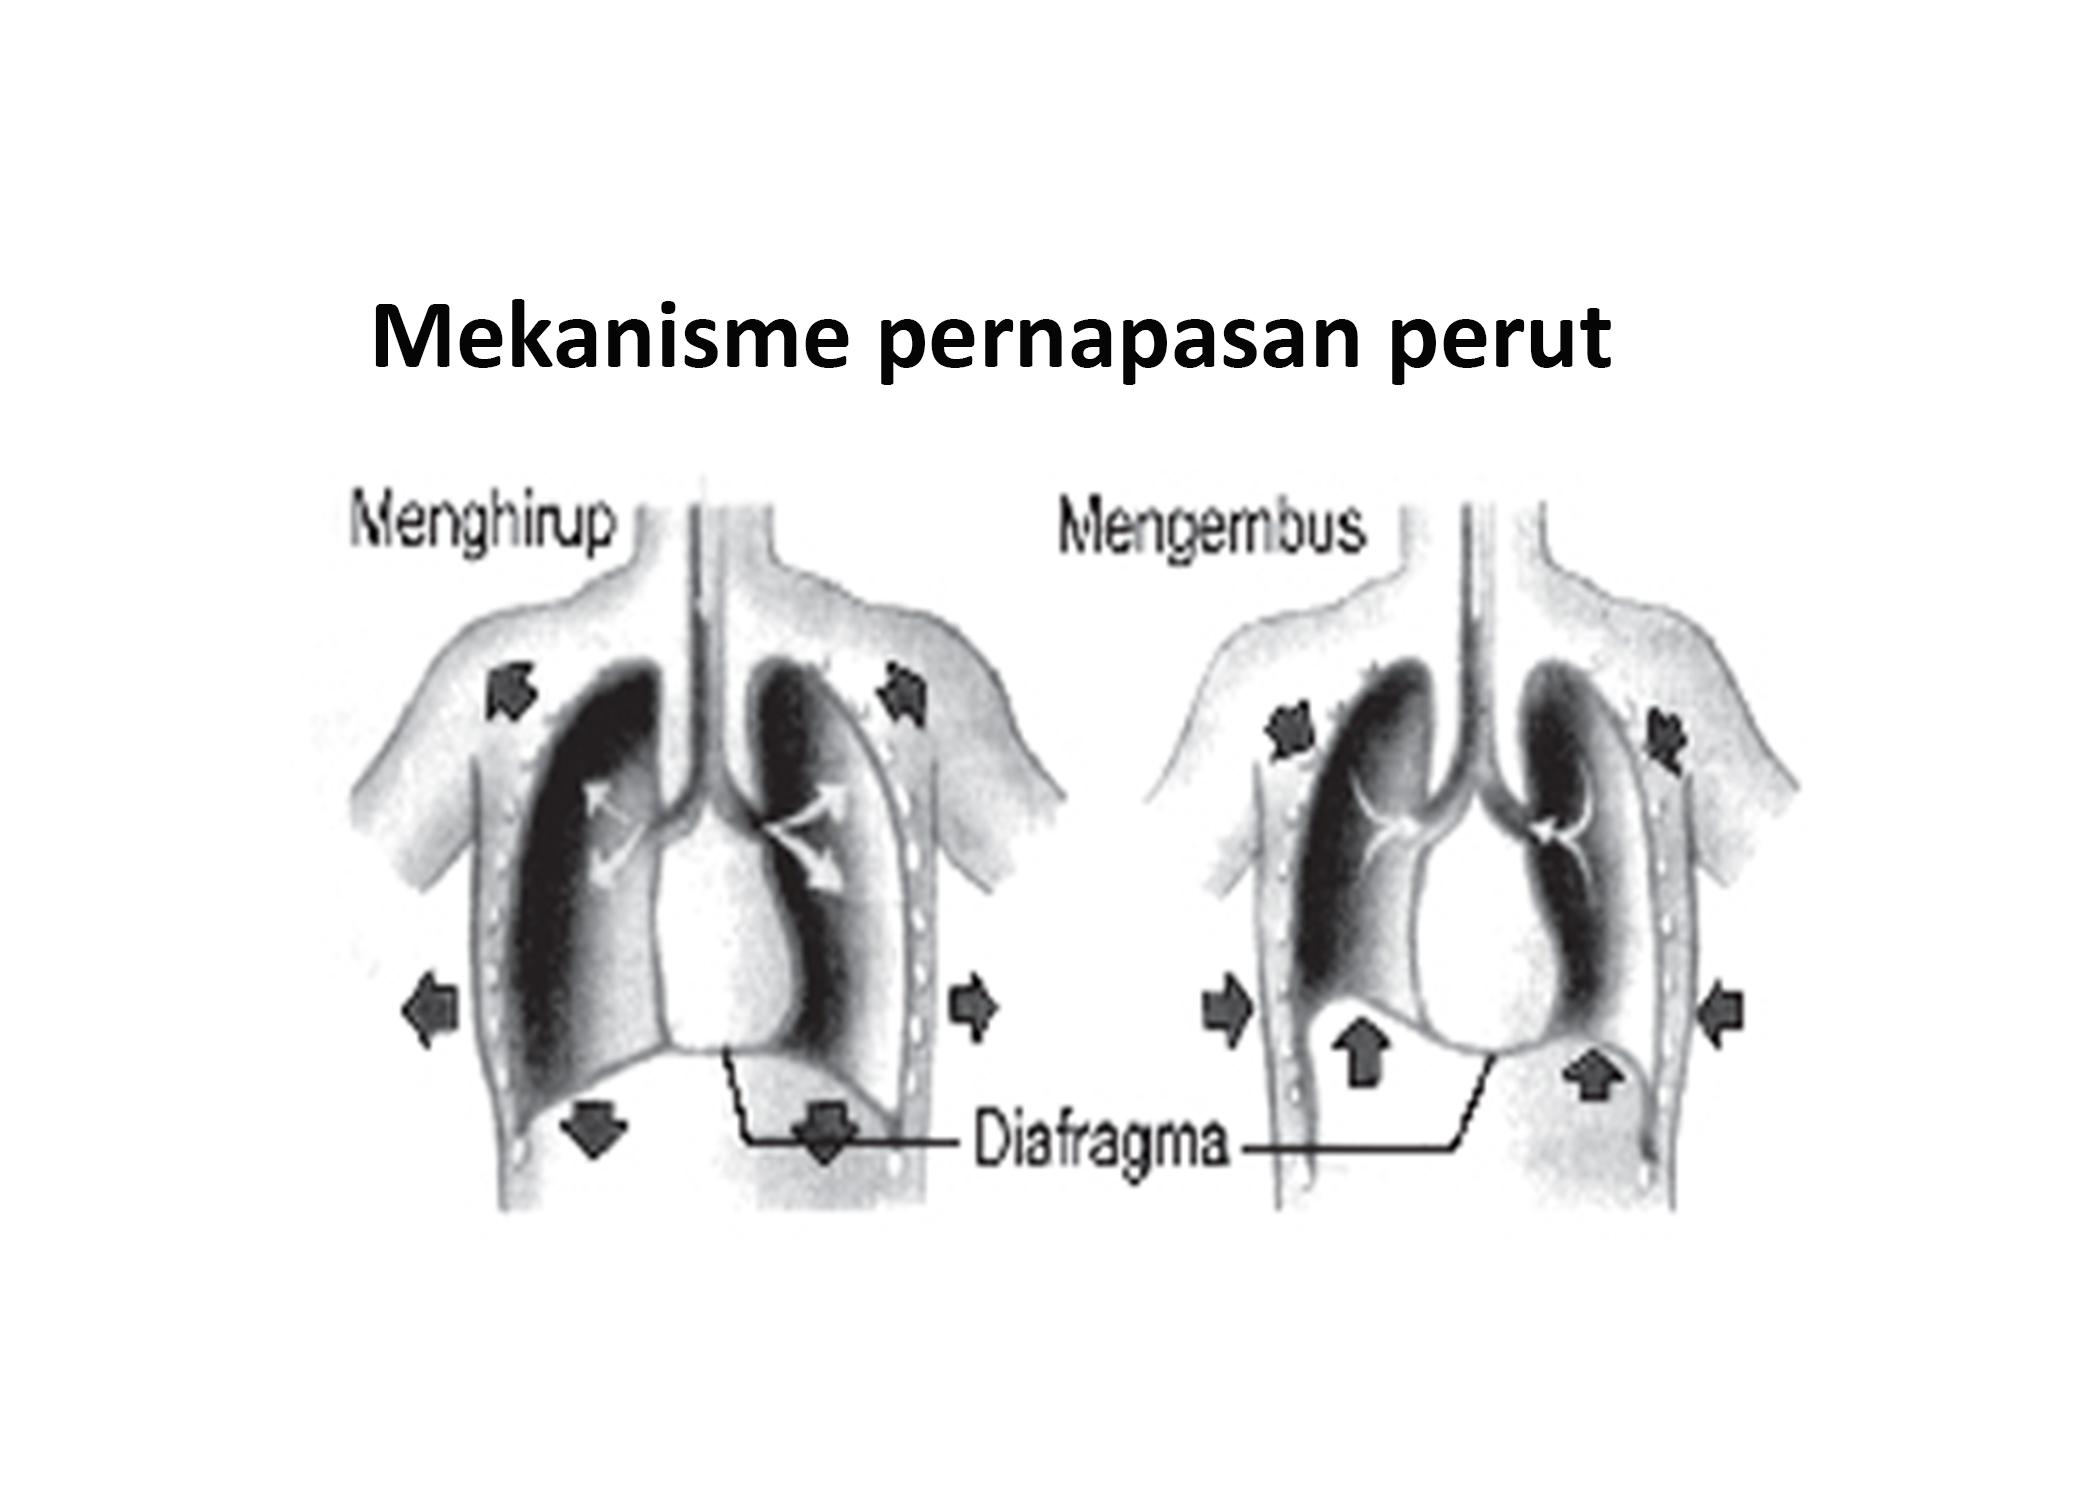 Mekanisme Pernapasan Perut Manusia Dosenbiologi Com